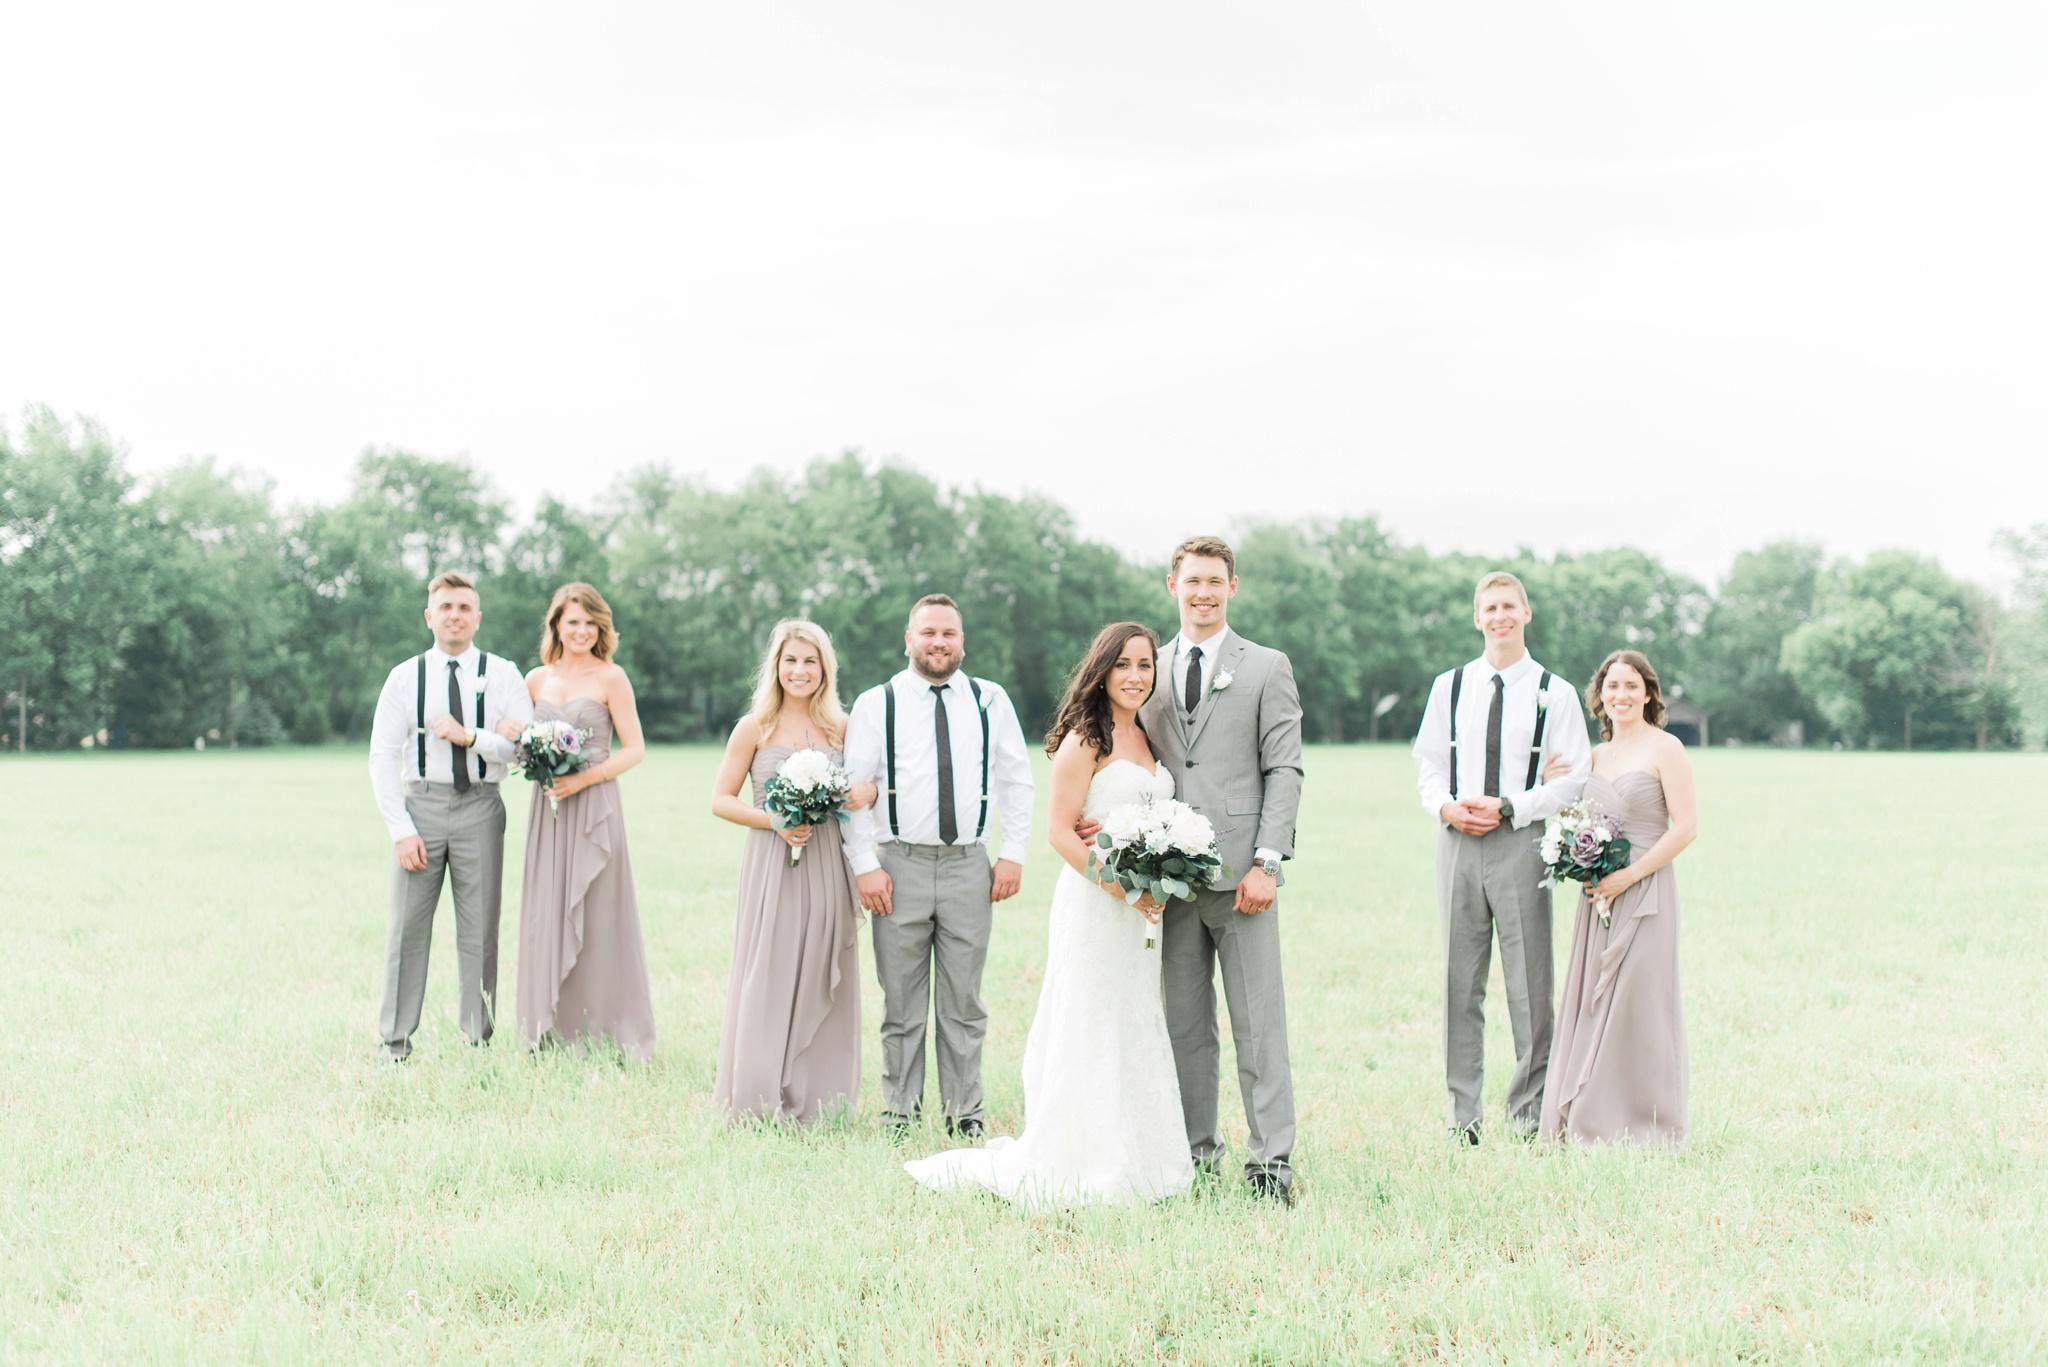 niederman-farm-wedding-cincinnati-ohio-photographer_0066.jpg